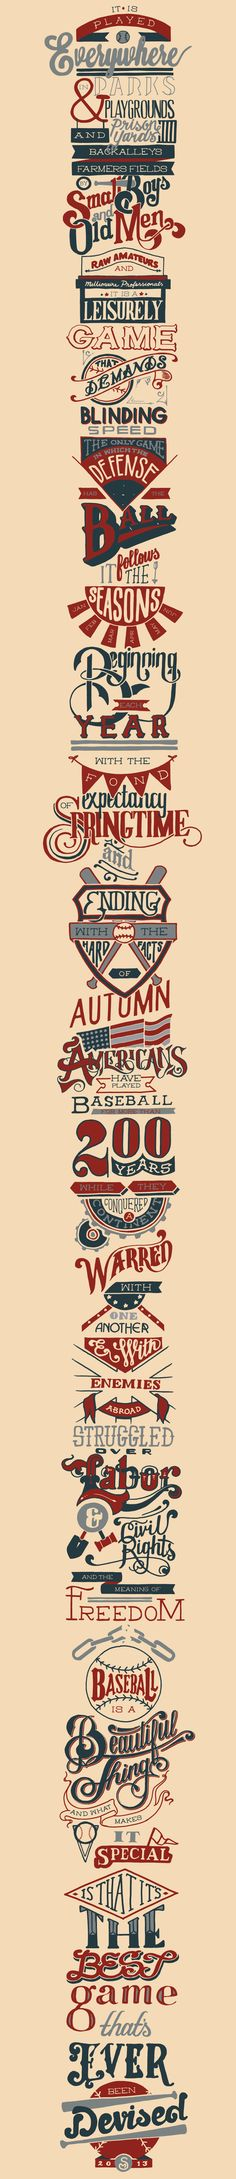 Baseball on Typography Served